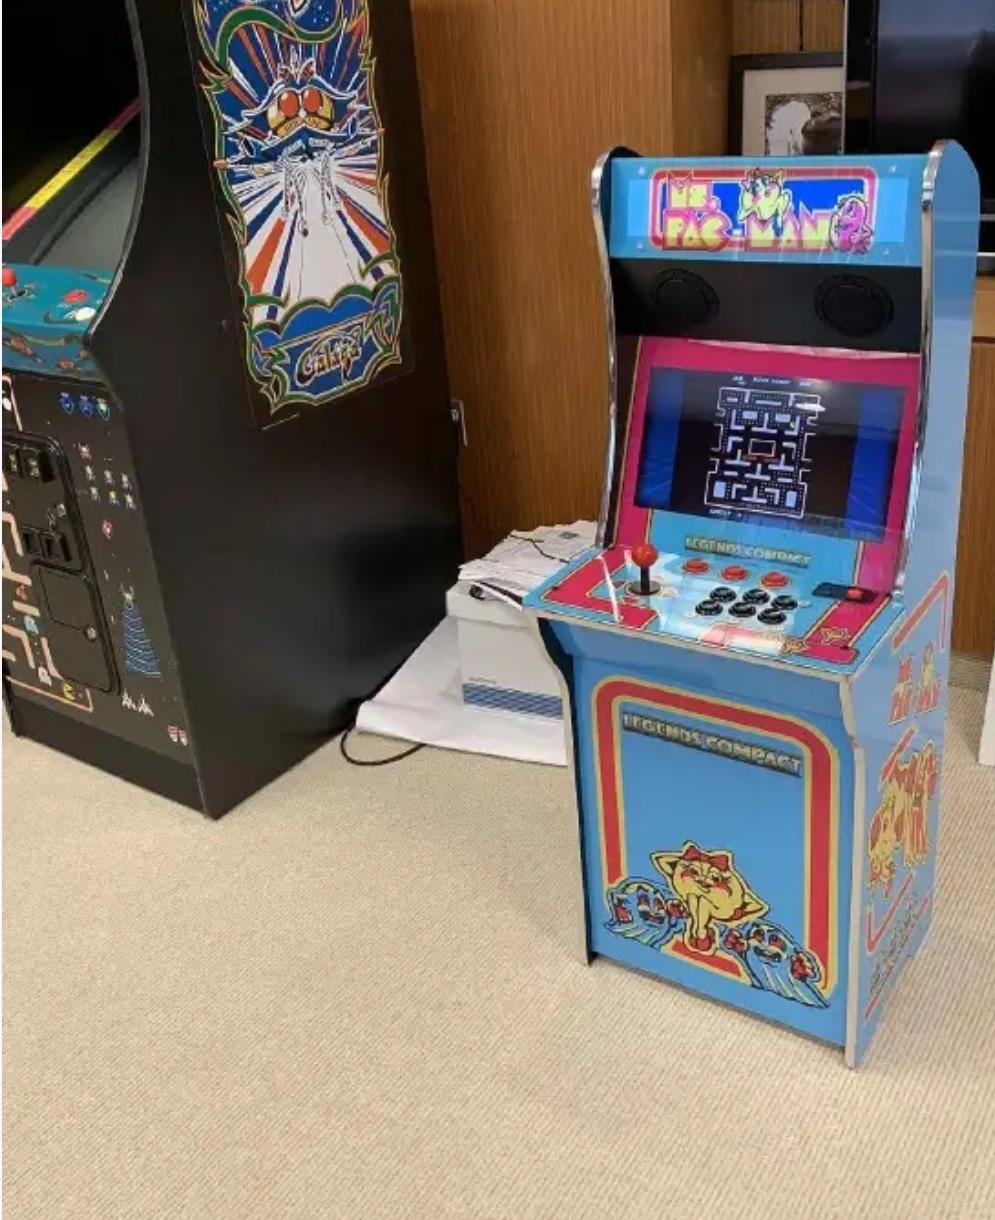 PAC-MAN ARCADE GAME ARCADE CLASSICS MS